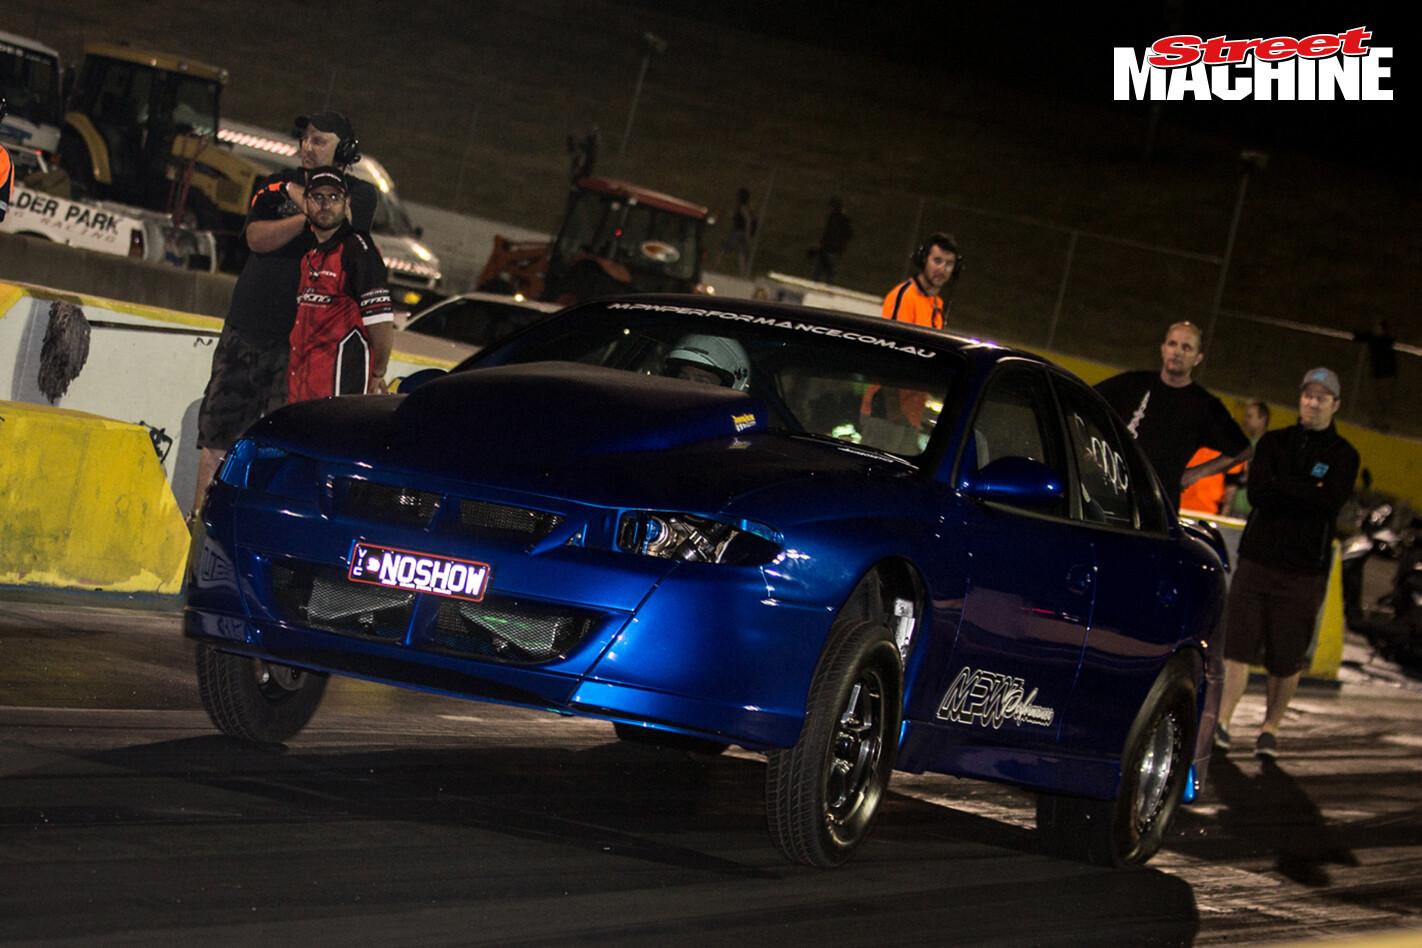 HSV VT Clubsport Race 6 Nw